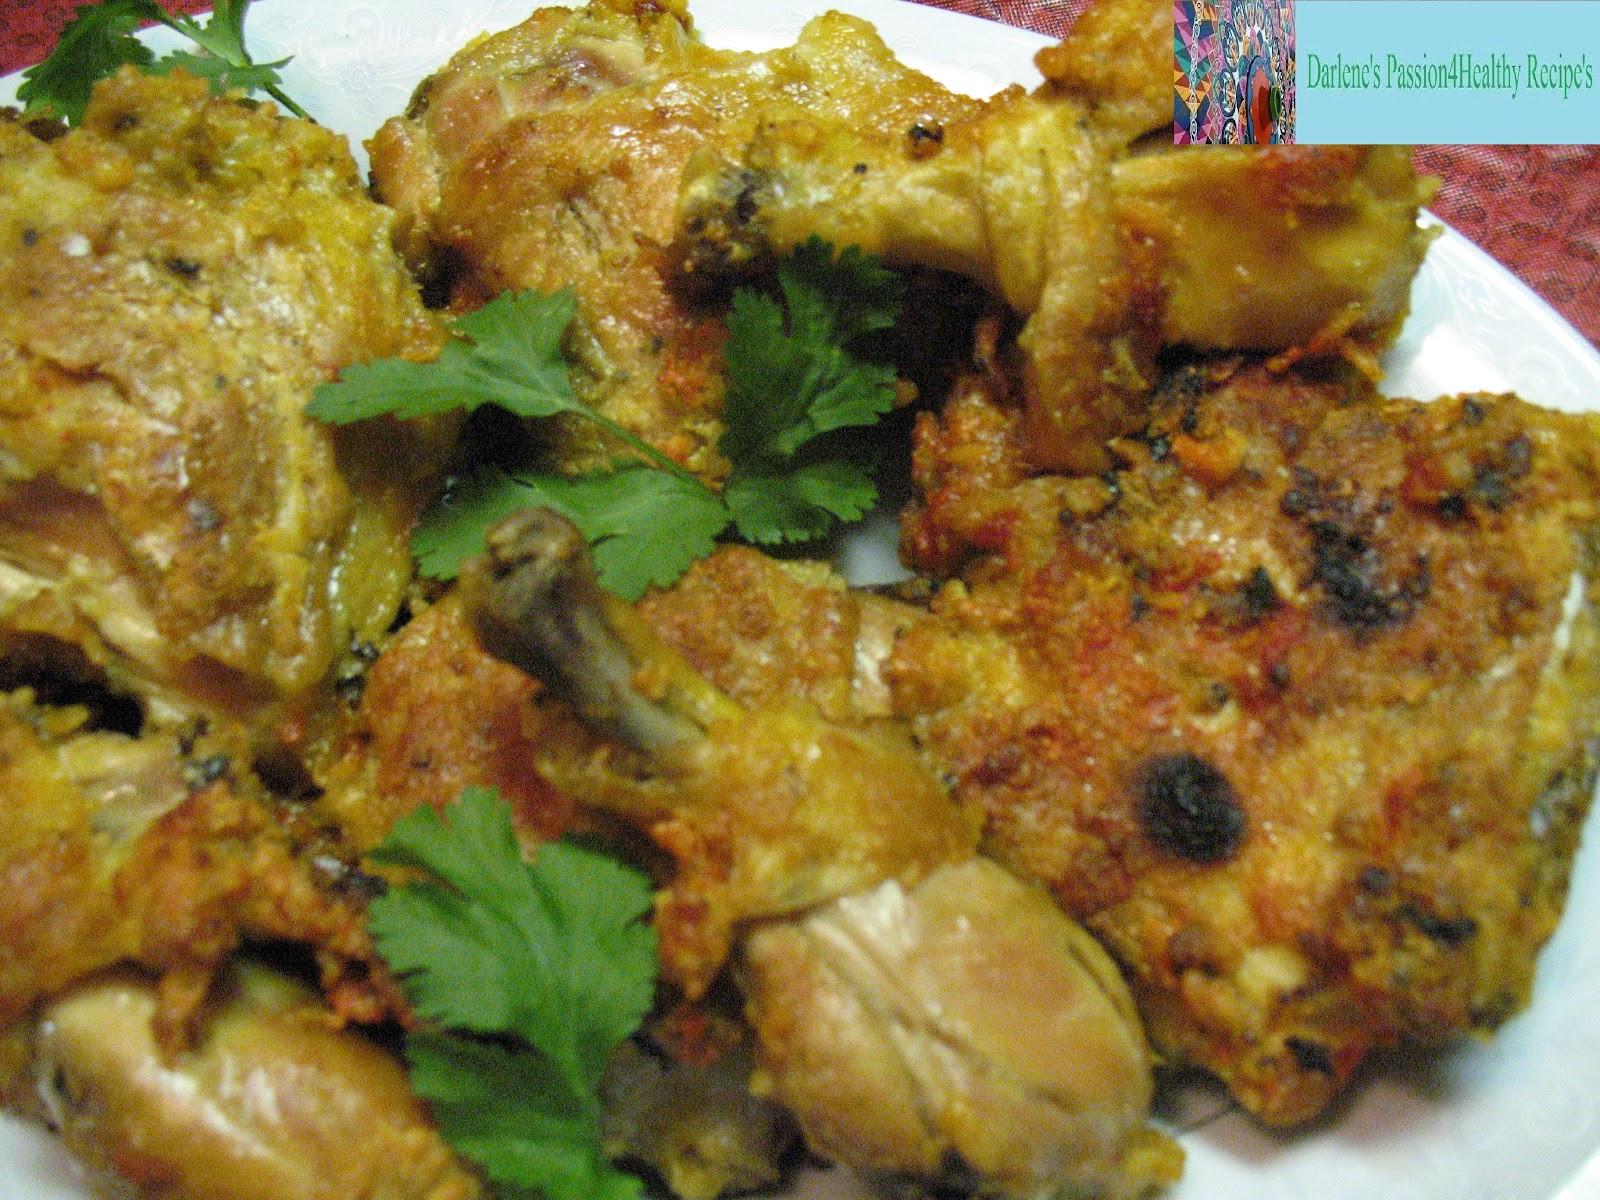 Healthy Fried Chicken Recipe  Darlene s Passion4Healthy Recipes Healthy Fried Chicken